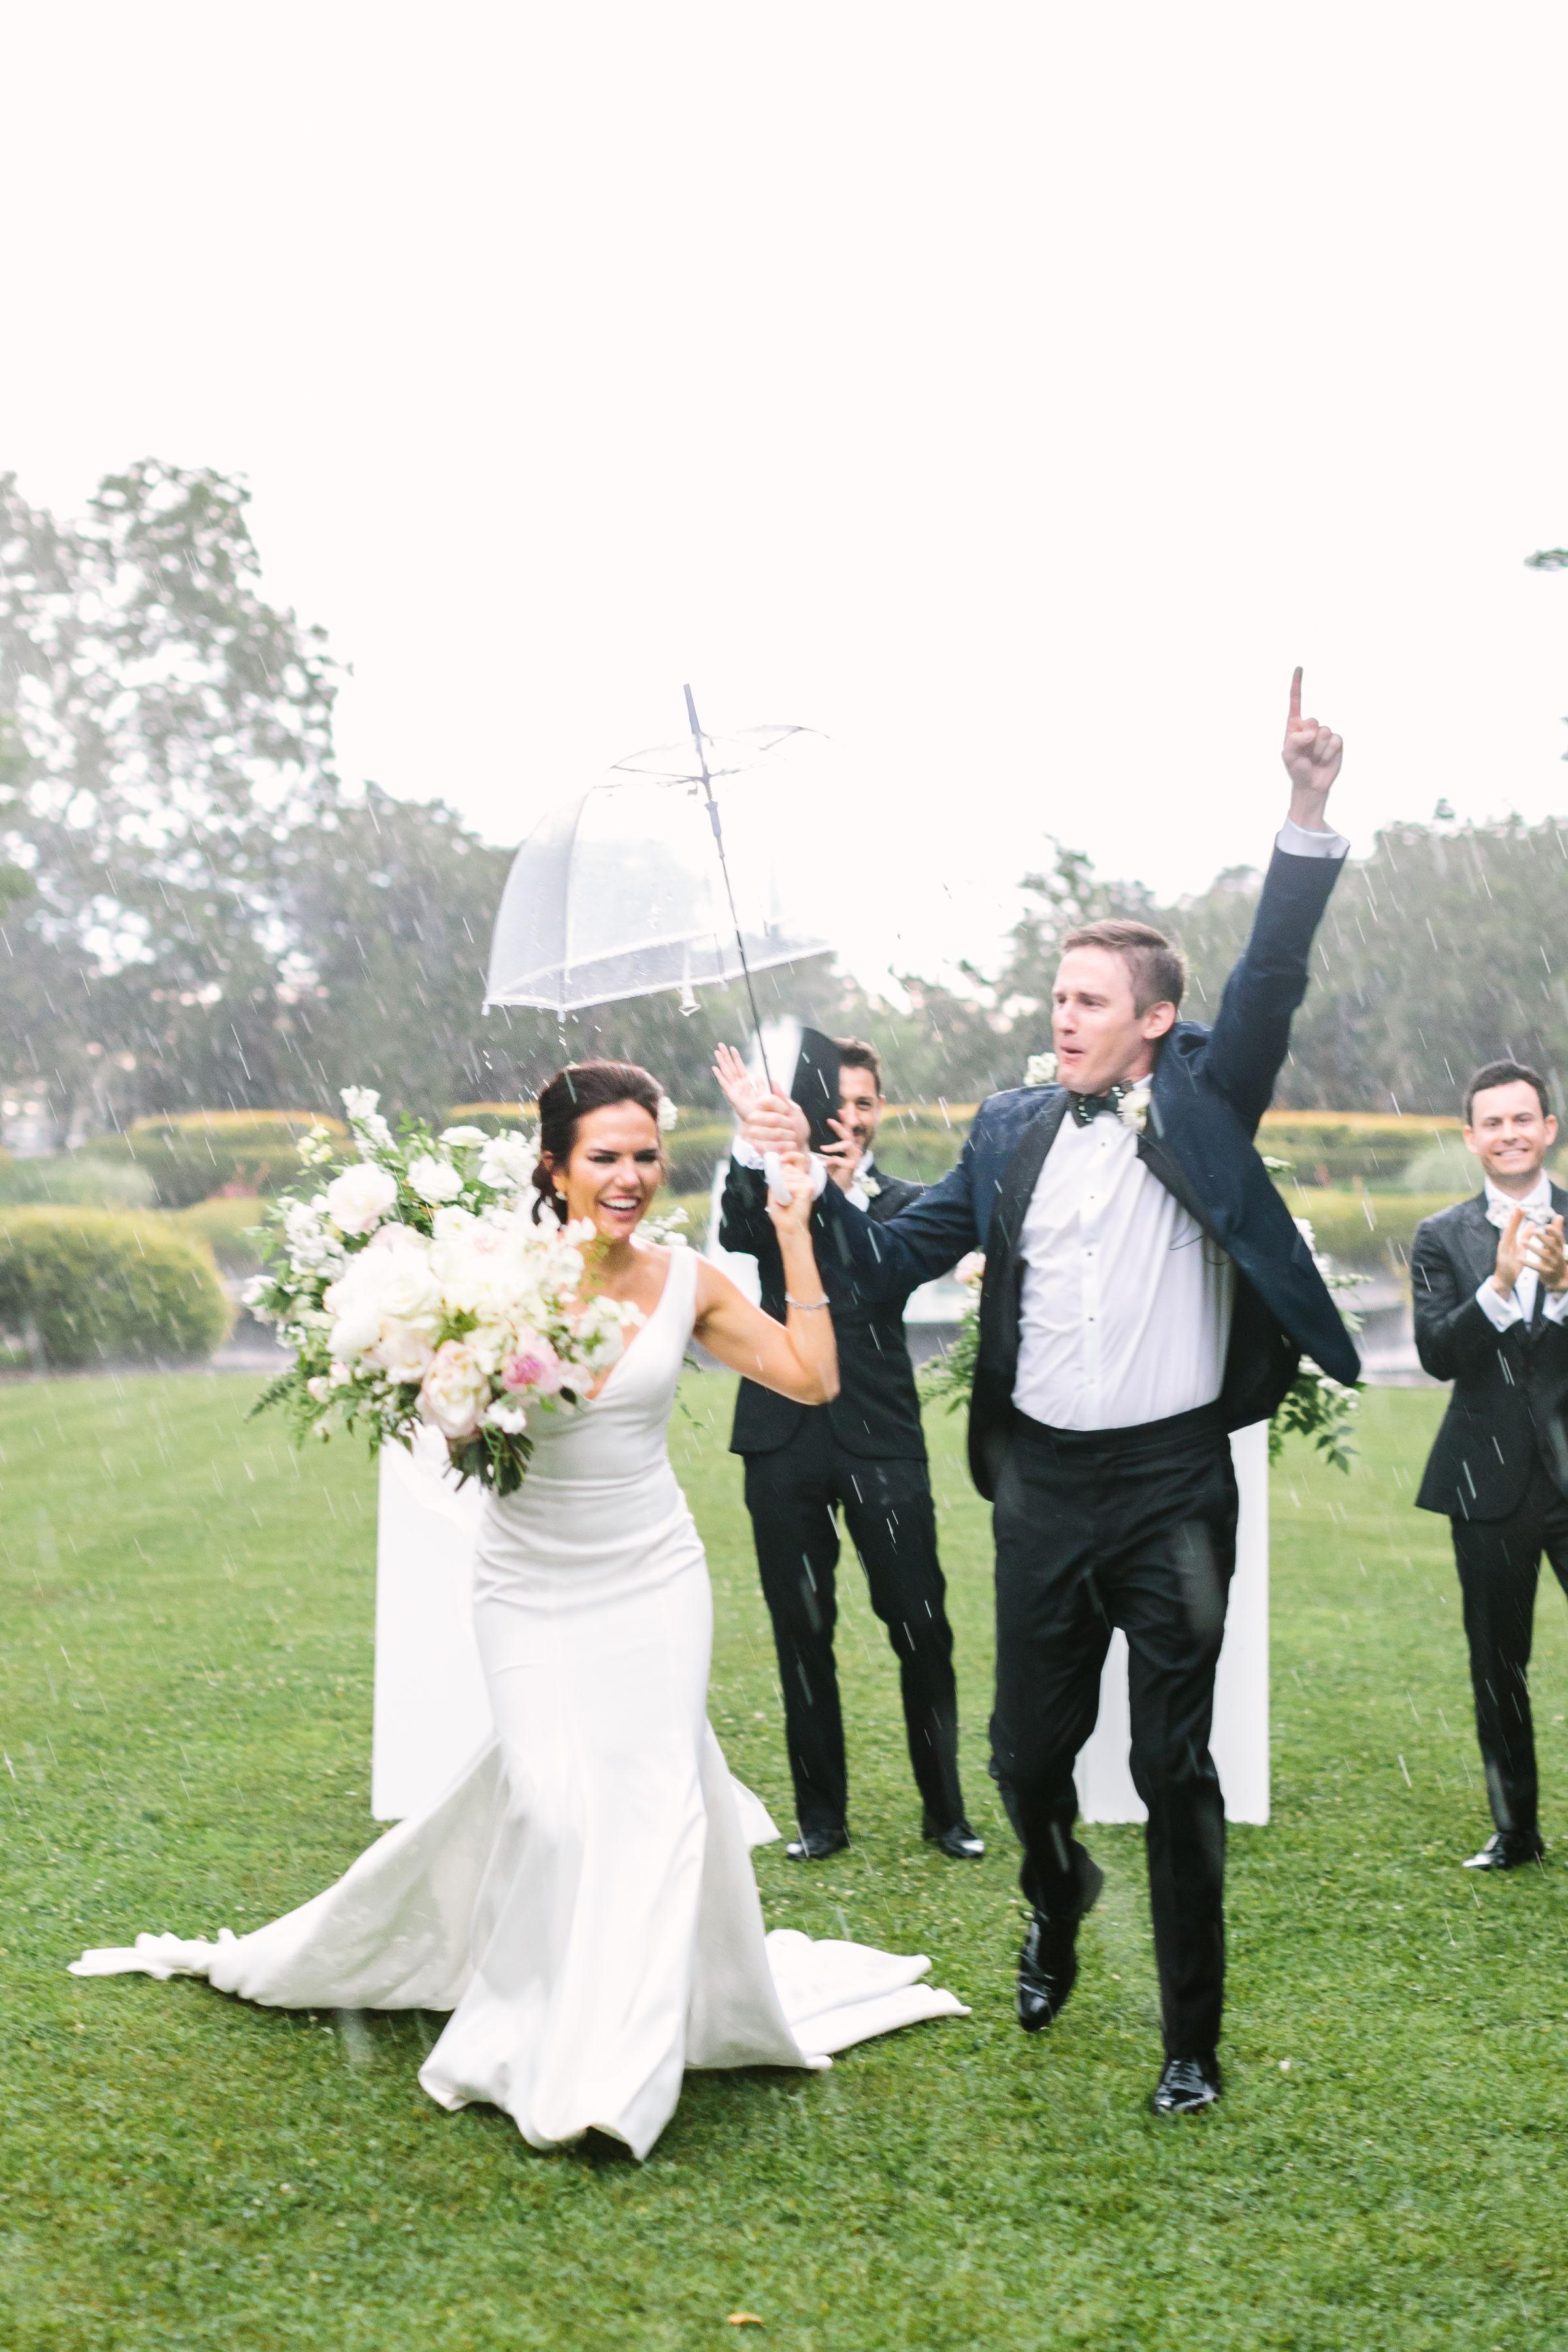 Ellen-Ashton-Photography-Dallas-Wedding-Photographers-Ivory-and-vine-Weddings-989.jpg